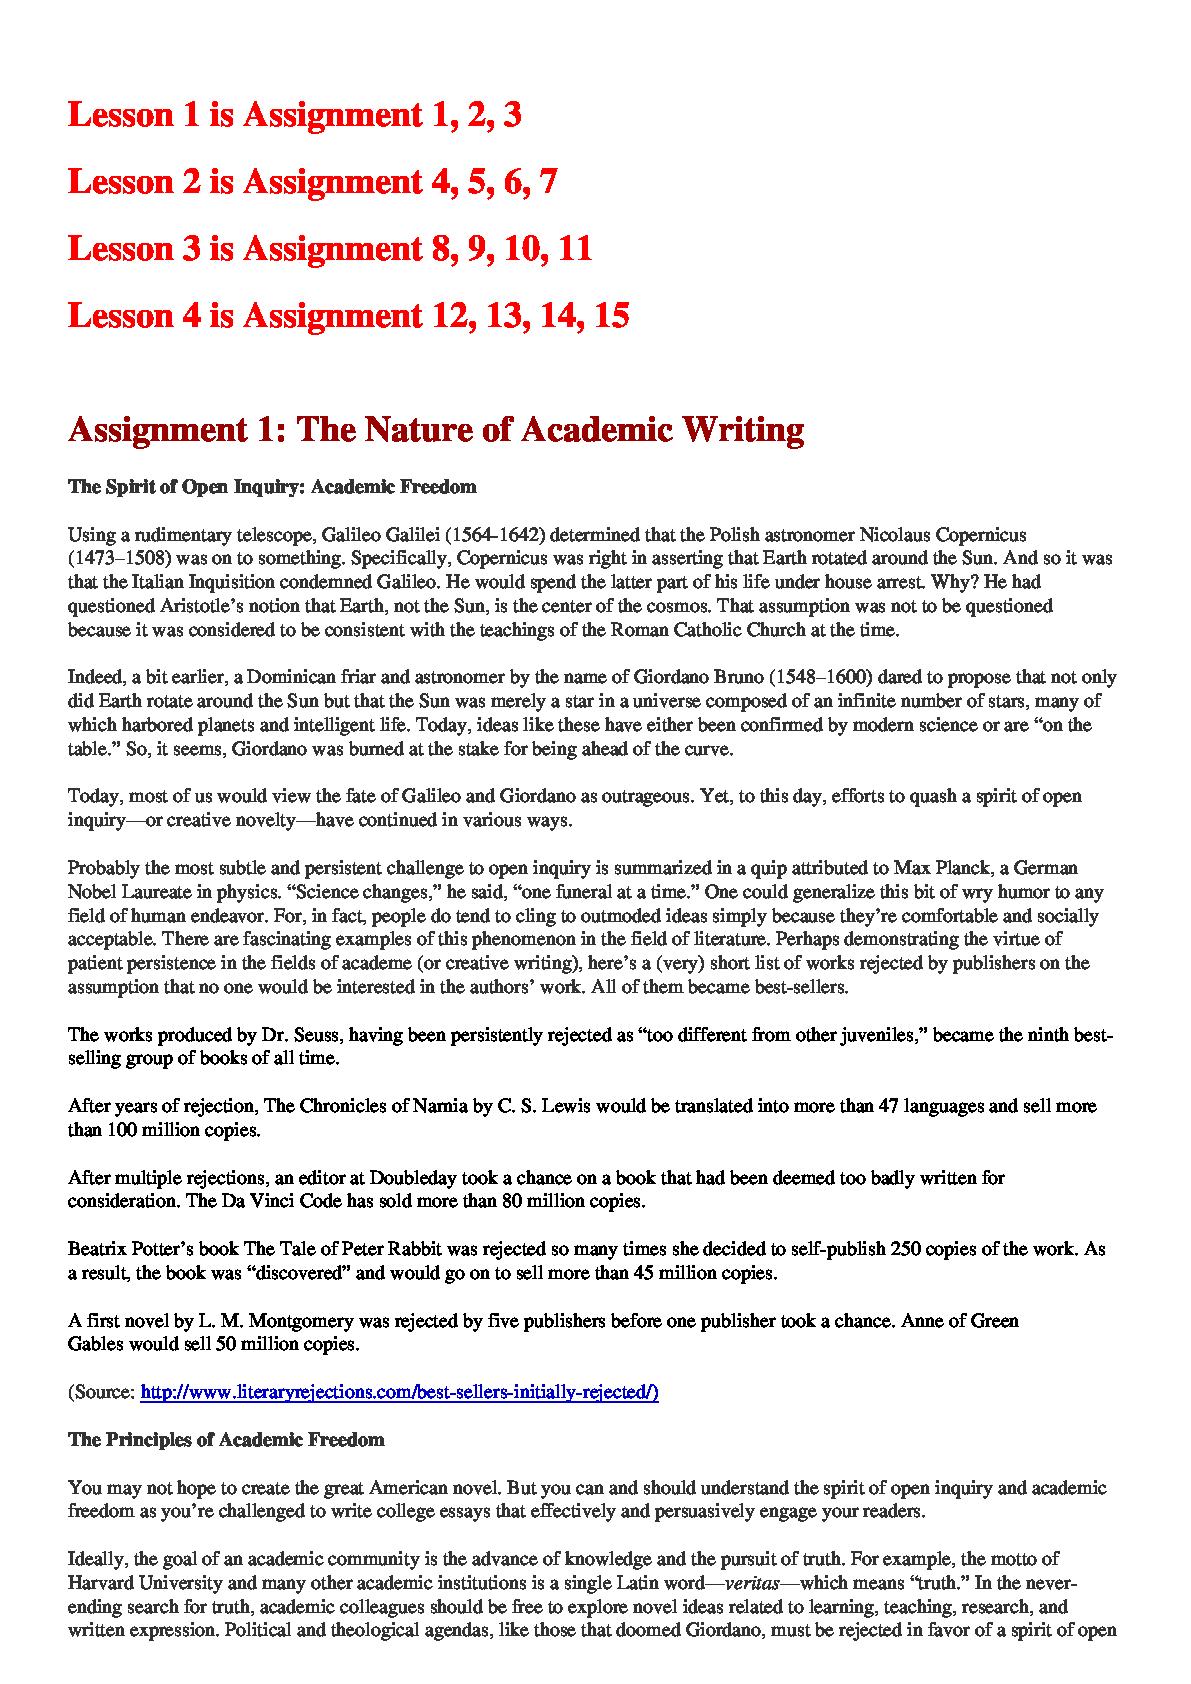 Sample process essay